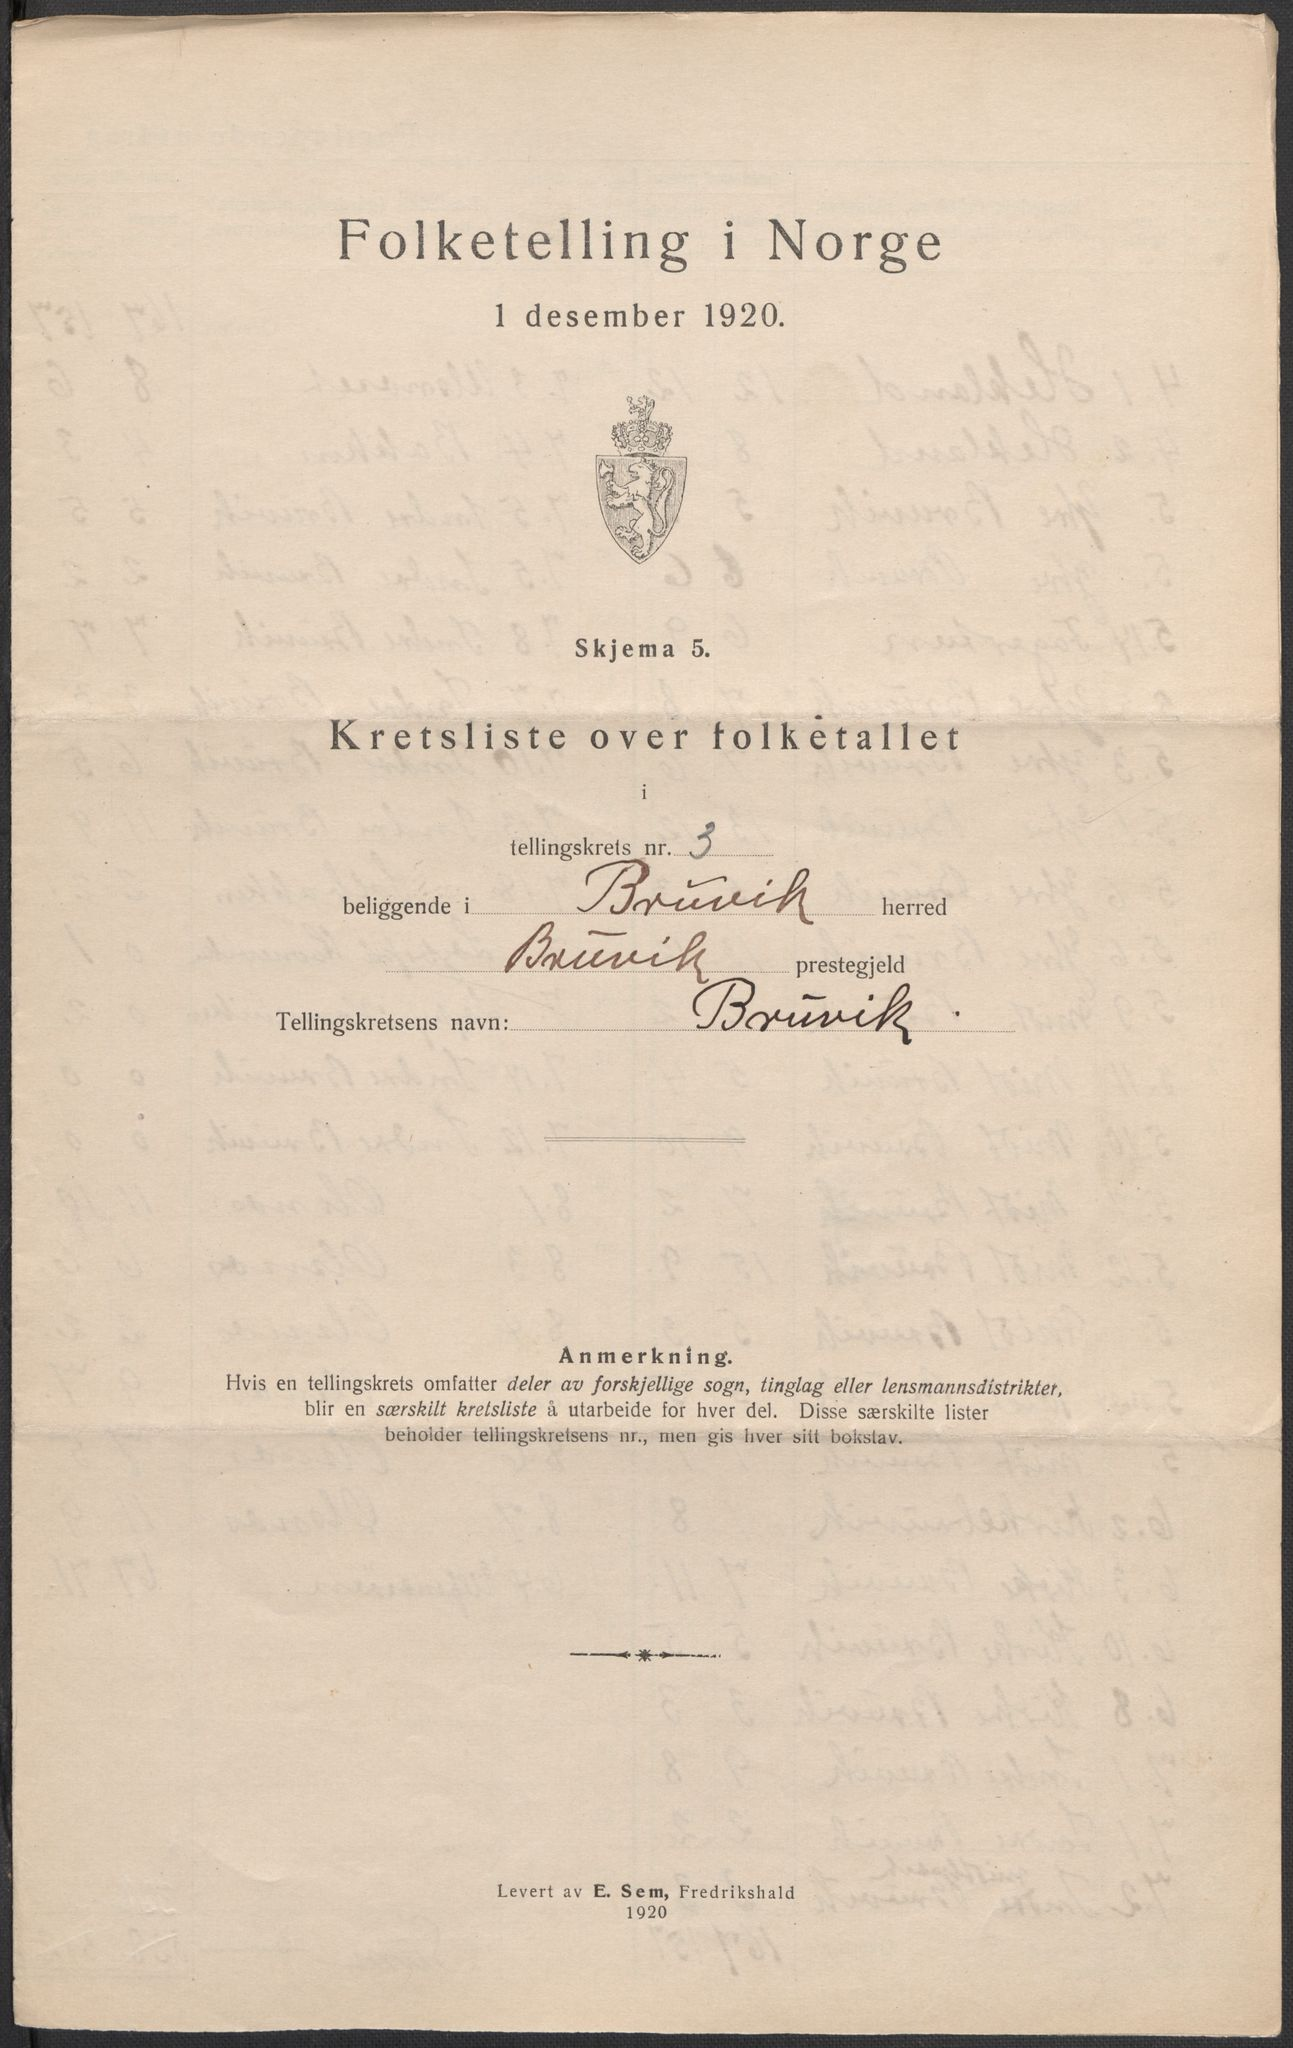 SAB, Folketelling 1920 for 1251 Bruvik herred, 1920, s. 12